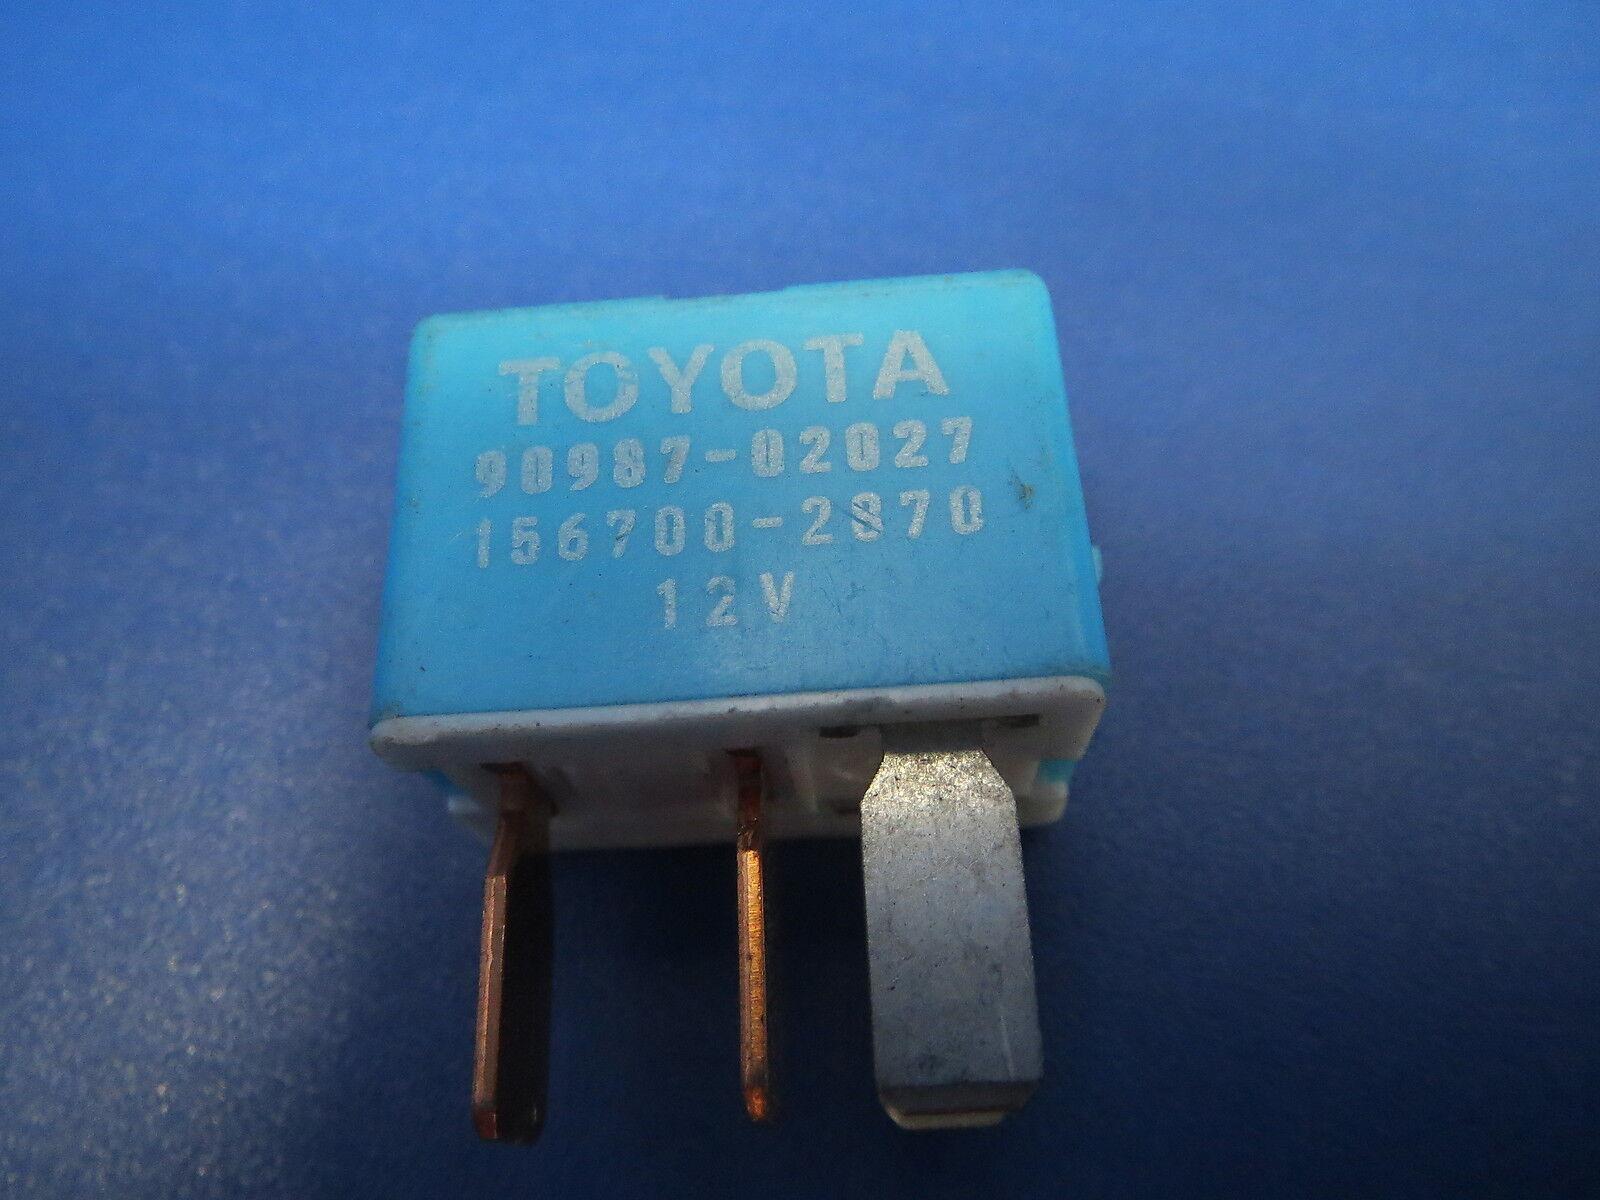 Fuse Box Relay Toyota 90987 02027 156700 2870 12v Blue Denso Oem Japan B3 For Sale